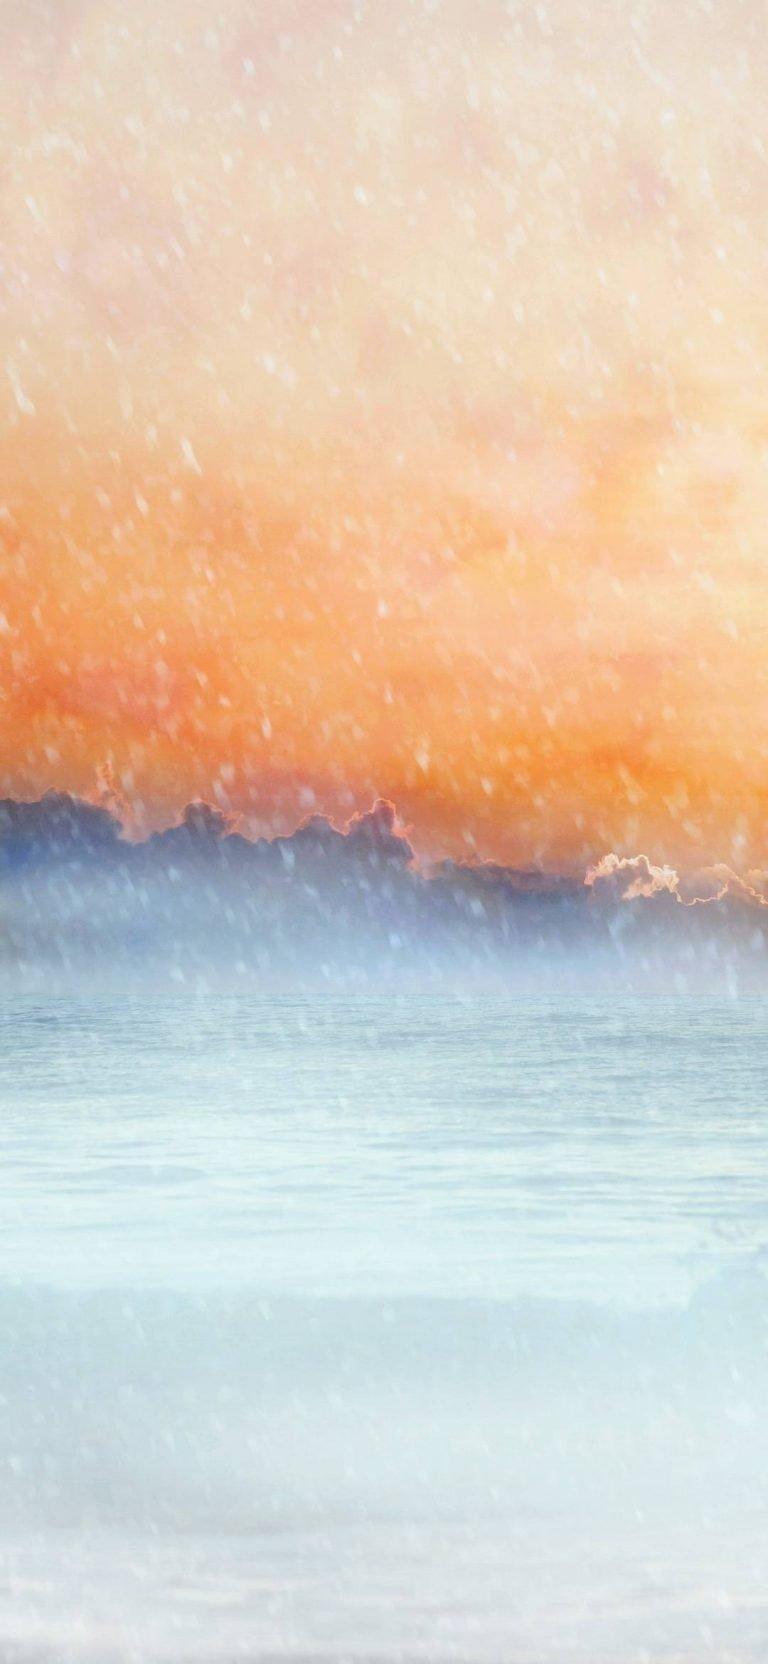 1080x2340-Wallpaper-098-768x1664 - 50+ Free Xiaomi Mi CC9 Phone Wallpapers [year]